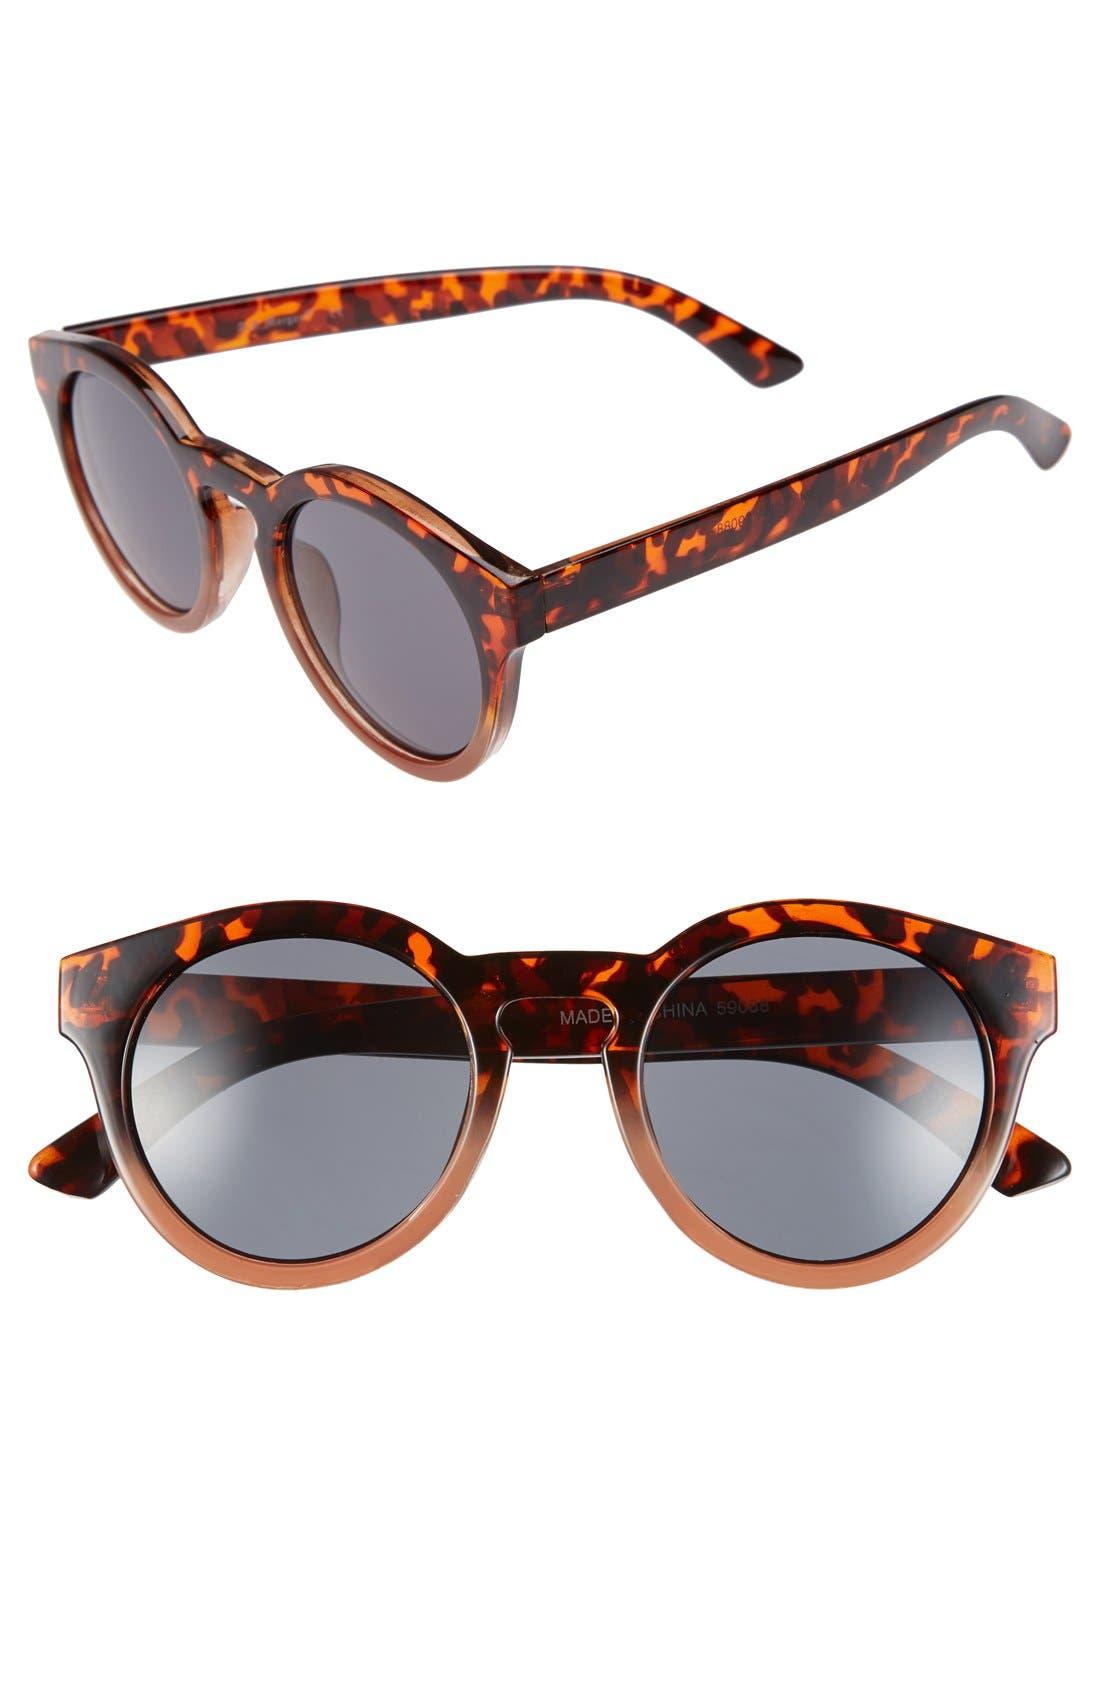 Alternate Image 1 Selected - A.J. Morgan 'Hmmm' 49mm Cat Eye Sunglasses